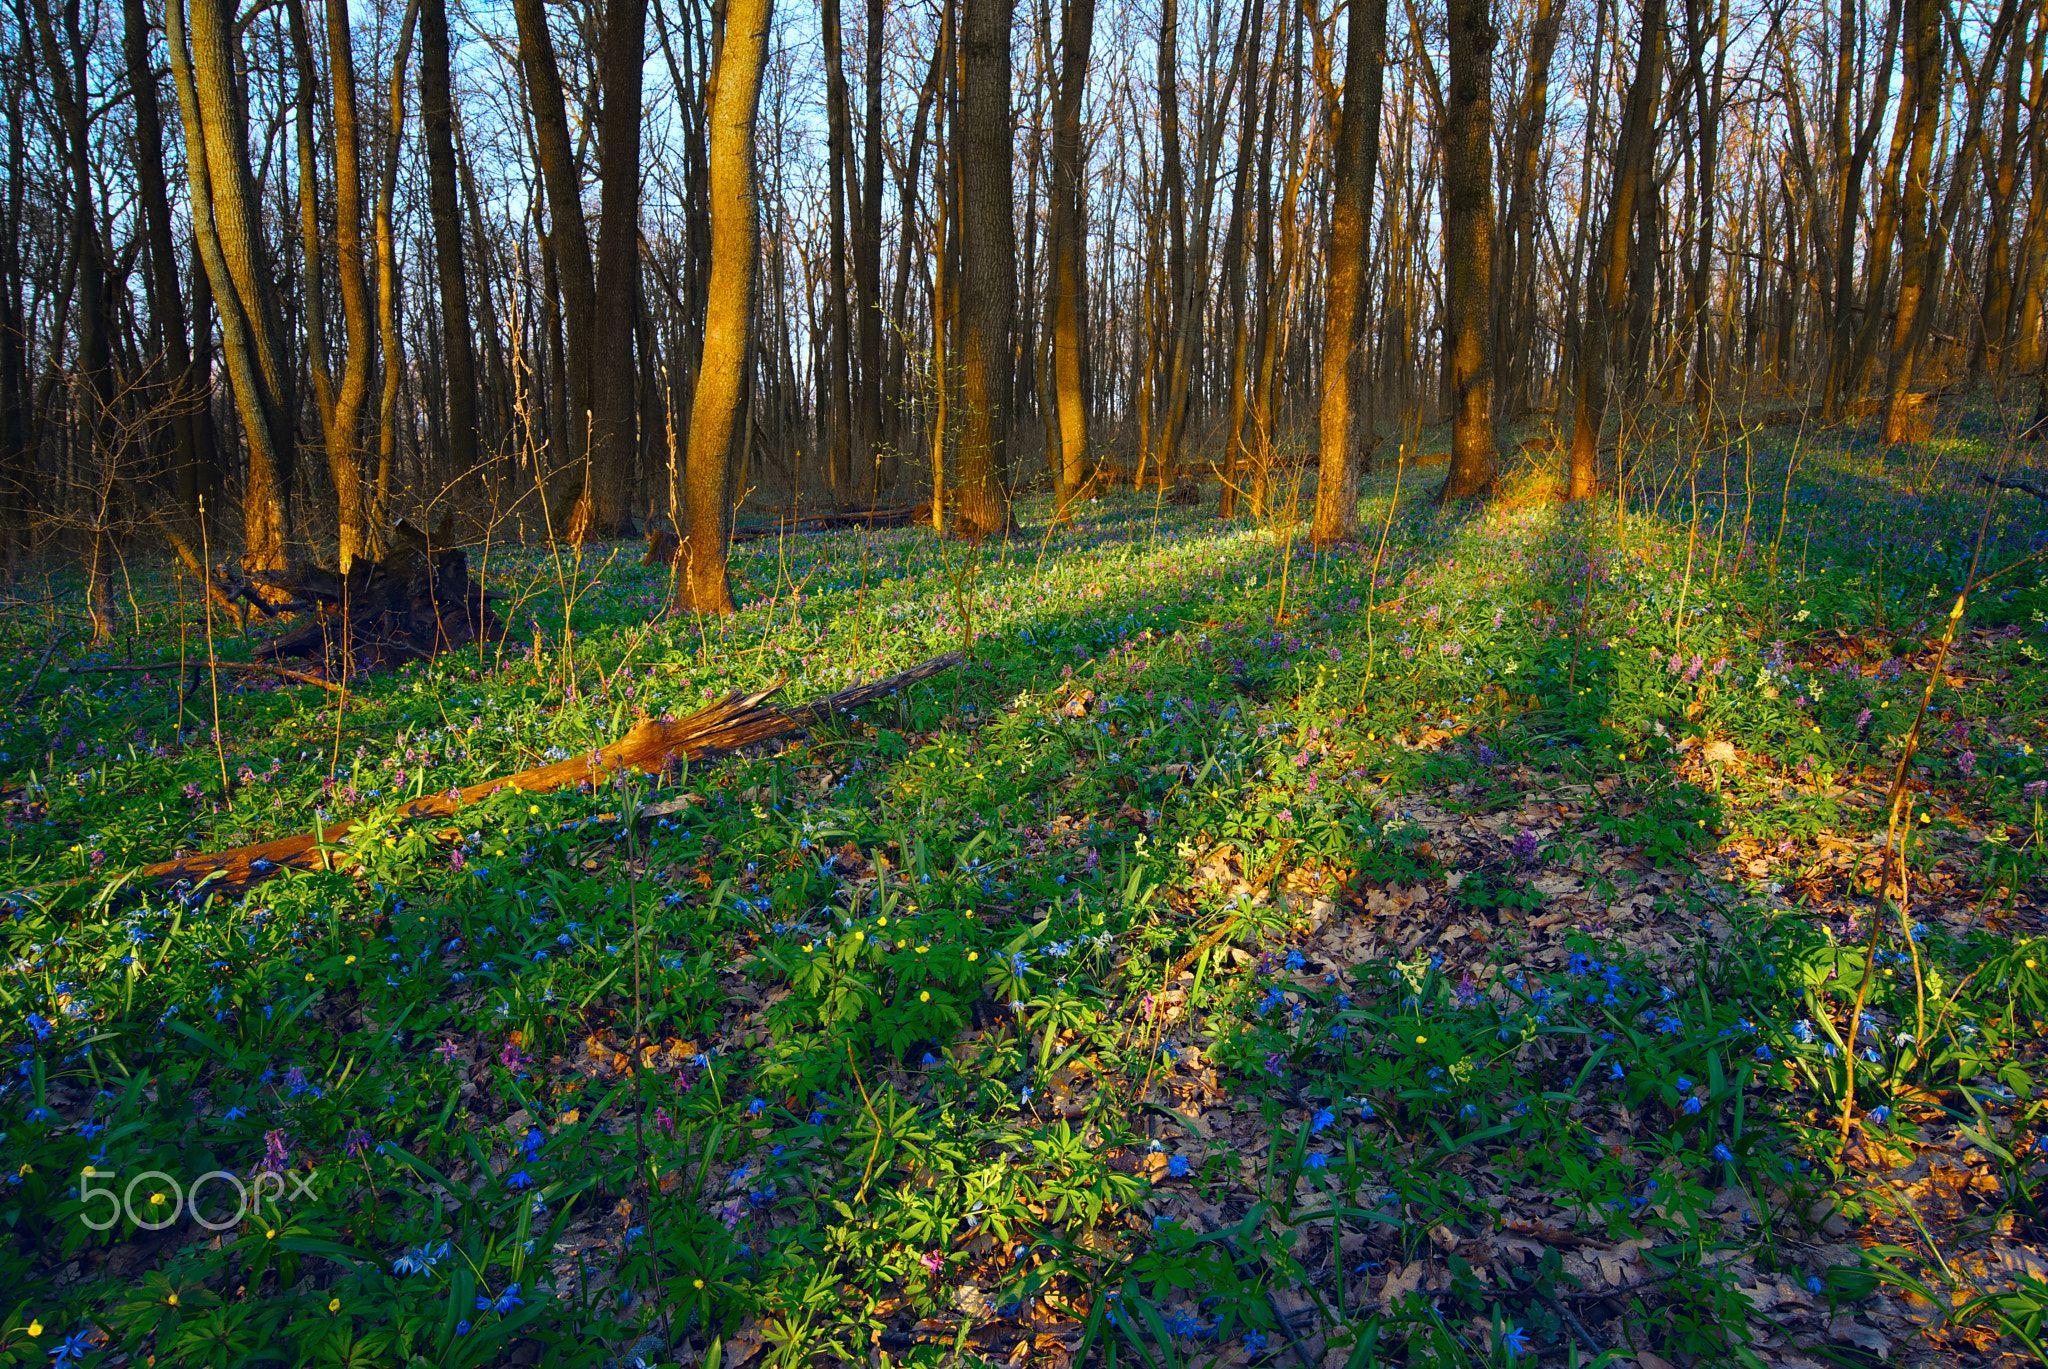 Sunlit Forest Full Of Snowdrop Flowers In Spring Season Beatiful